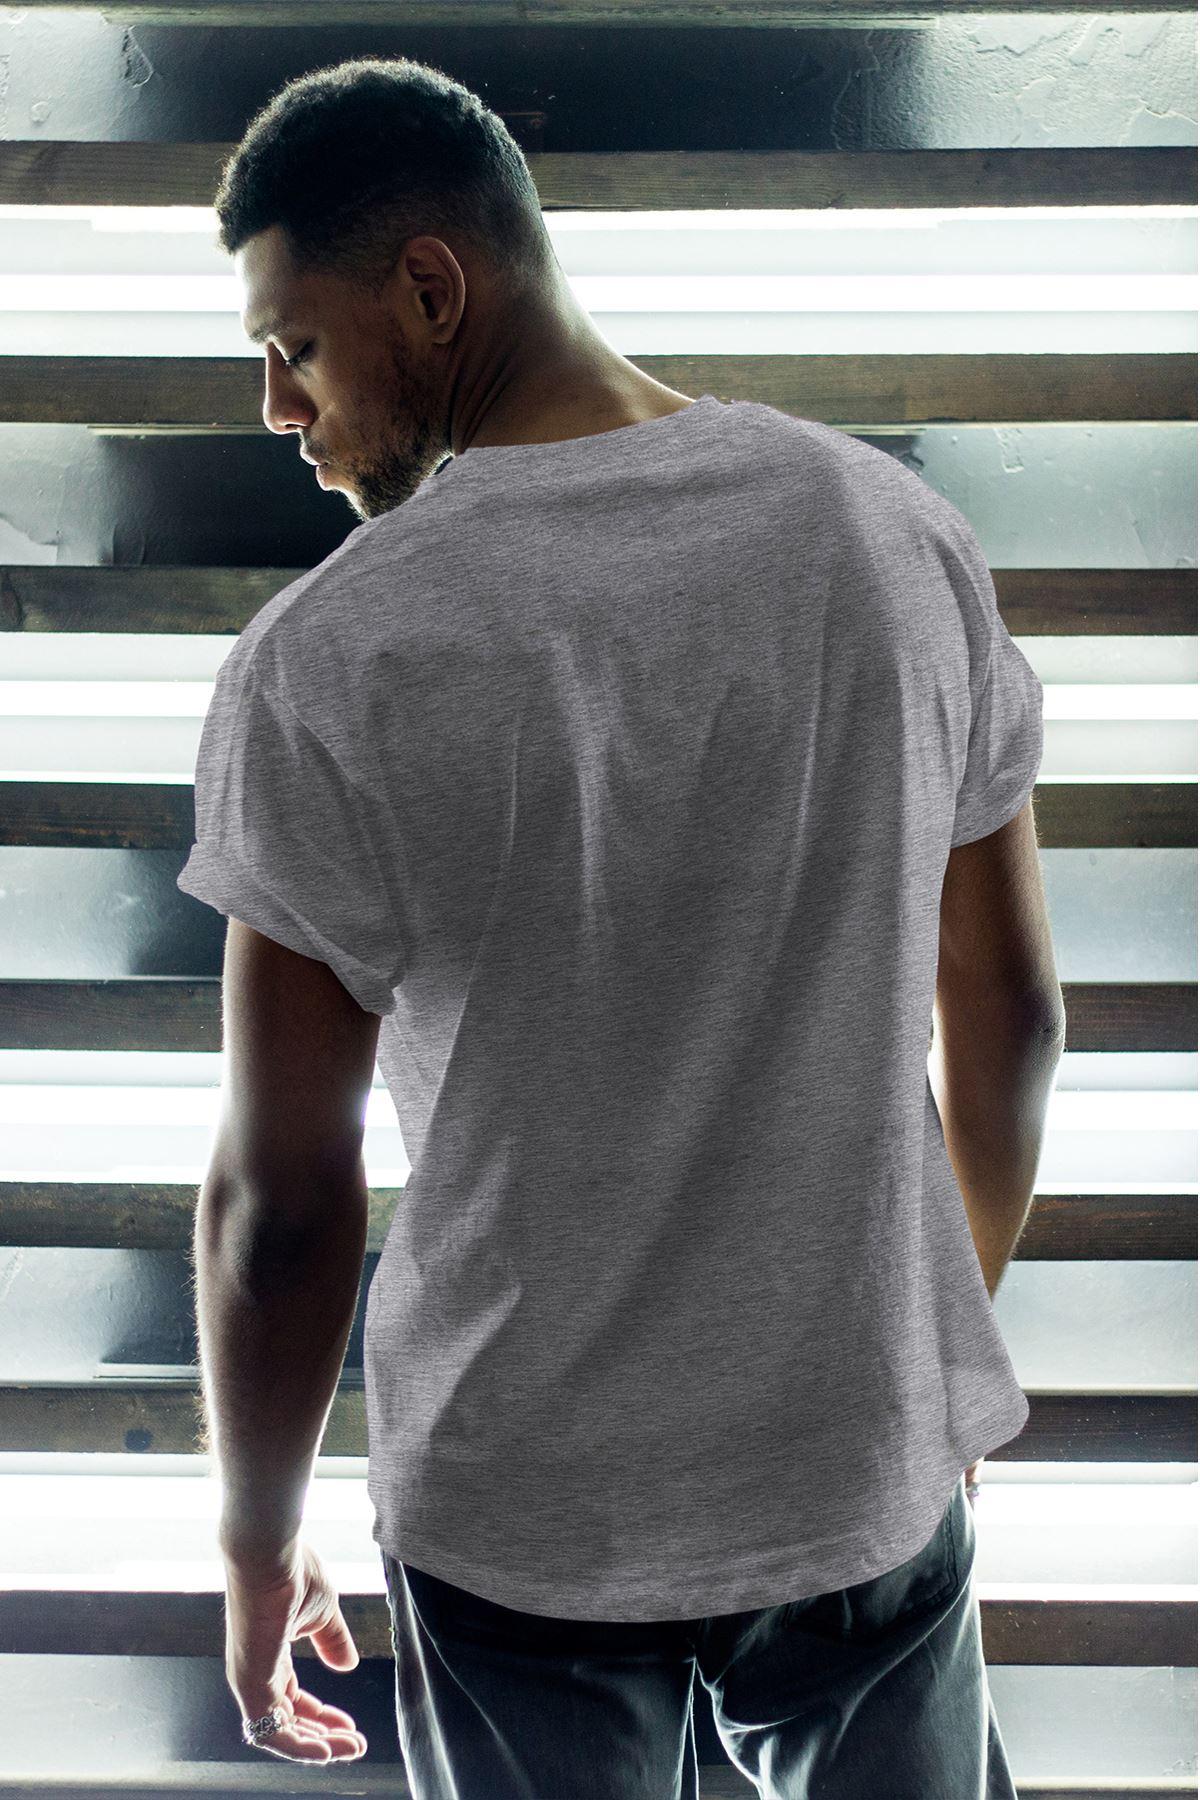 Boston Celtics 31 Gri Erkek Oversize Tshirt - Tişört